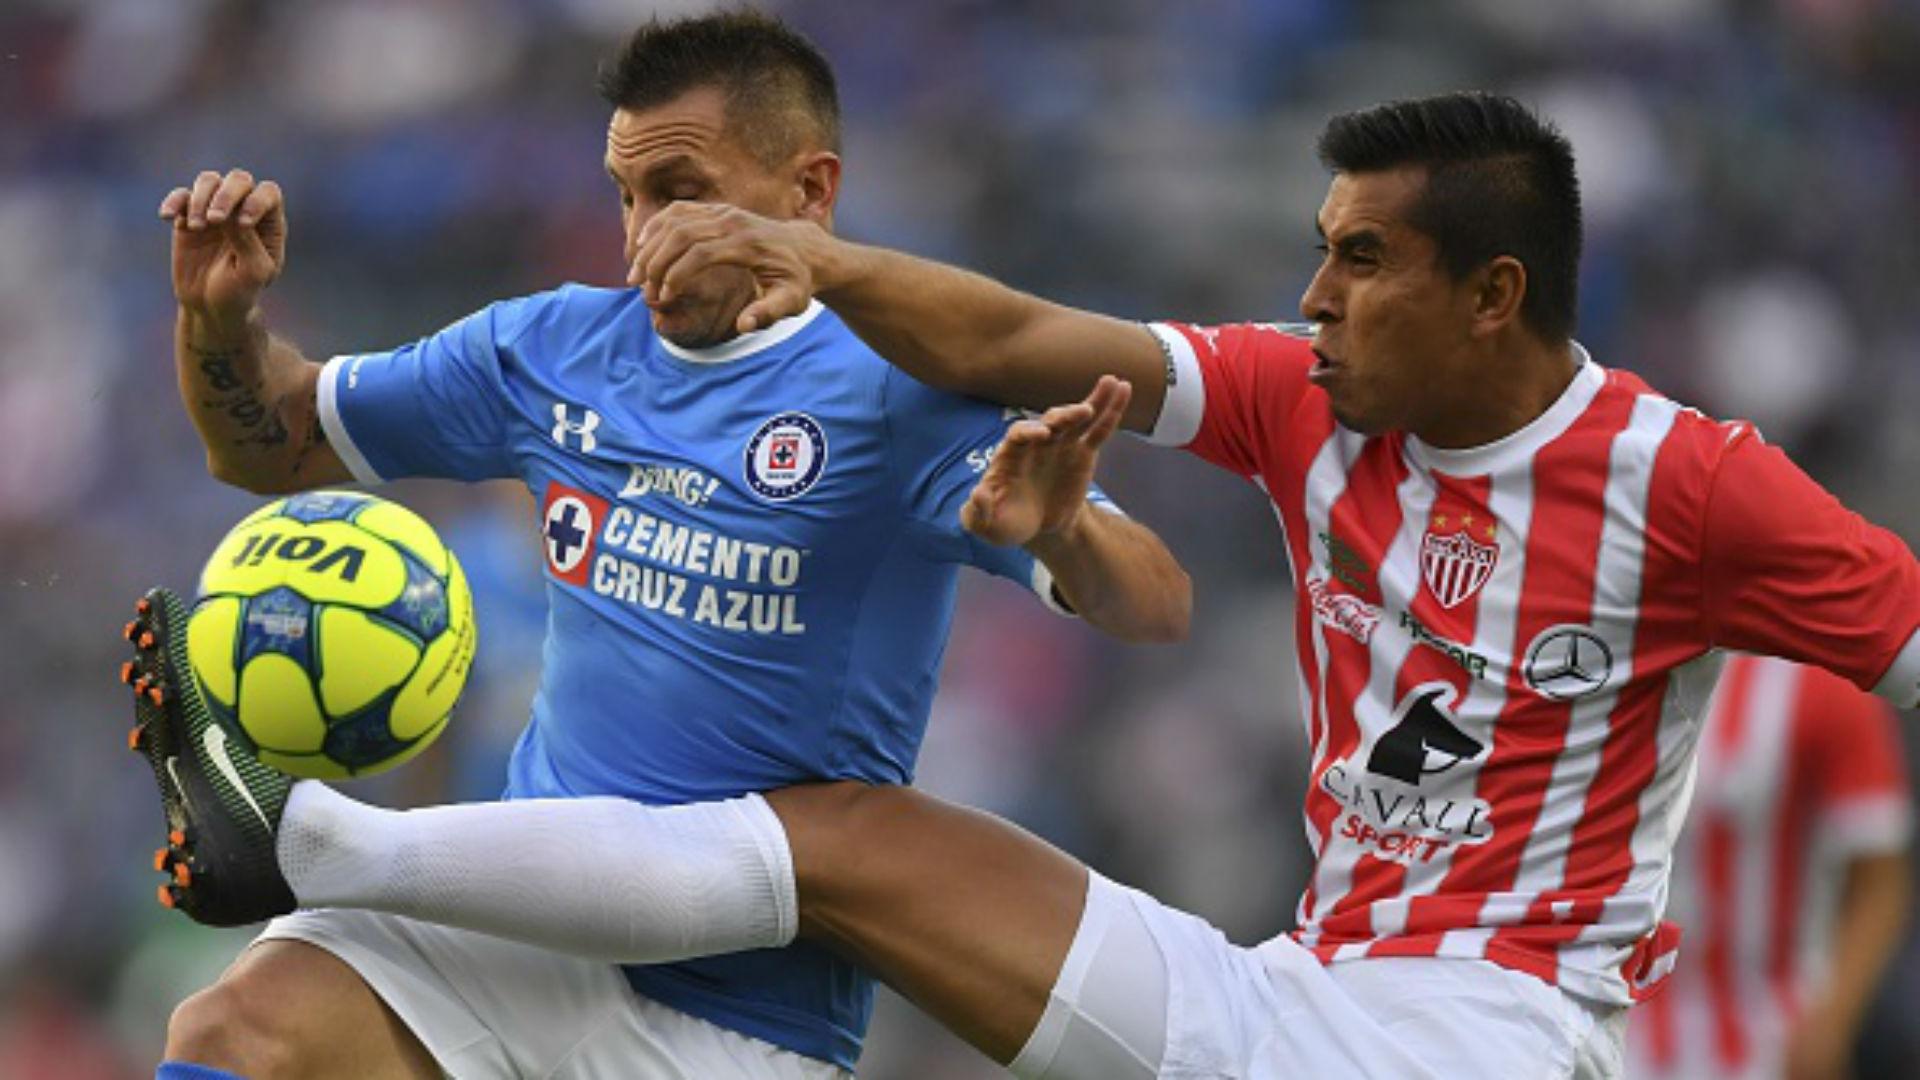 Jesús Isijara Cruz Azul Necaxa J1 C2017 Liga MX